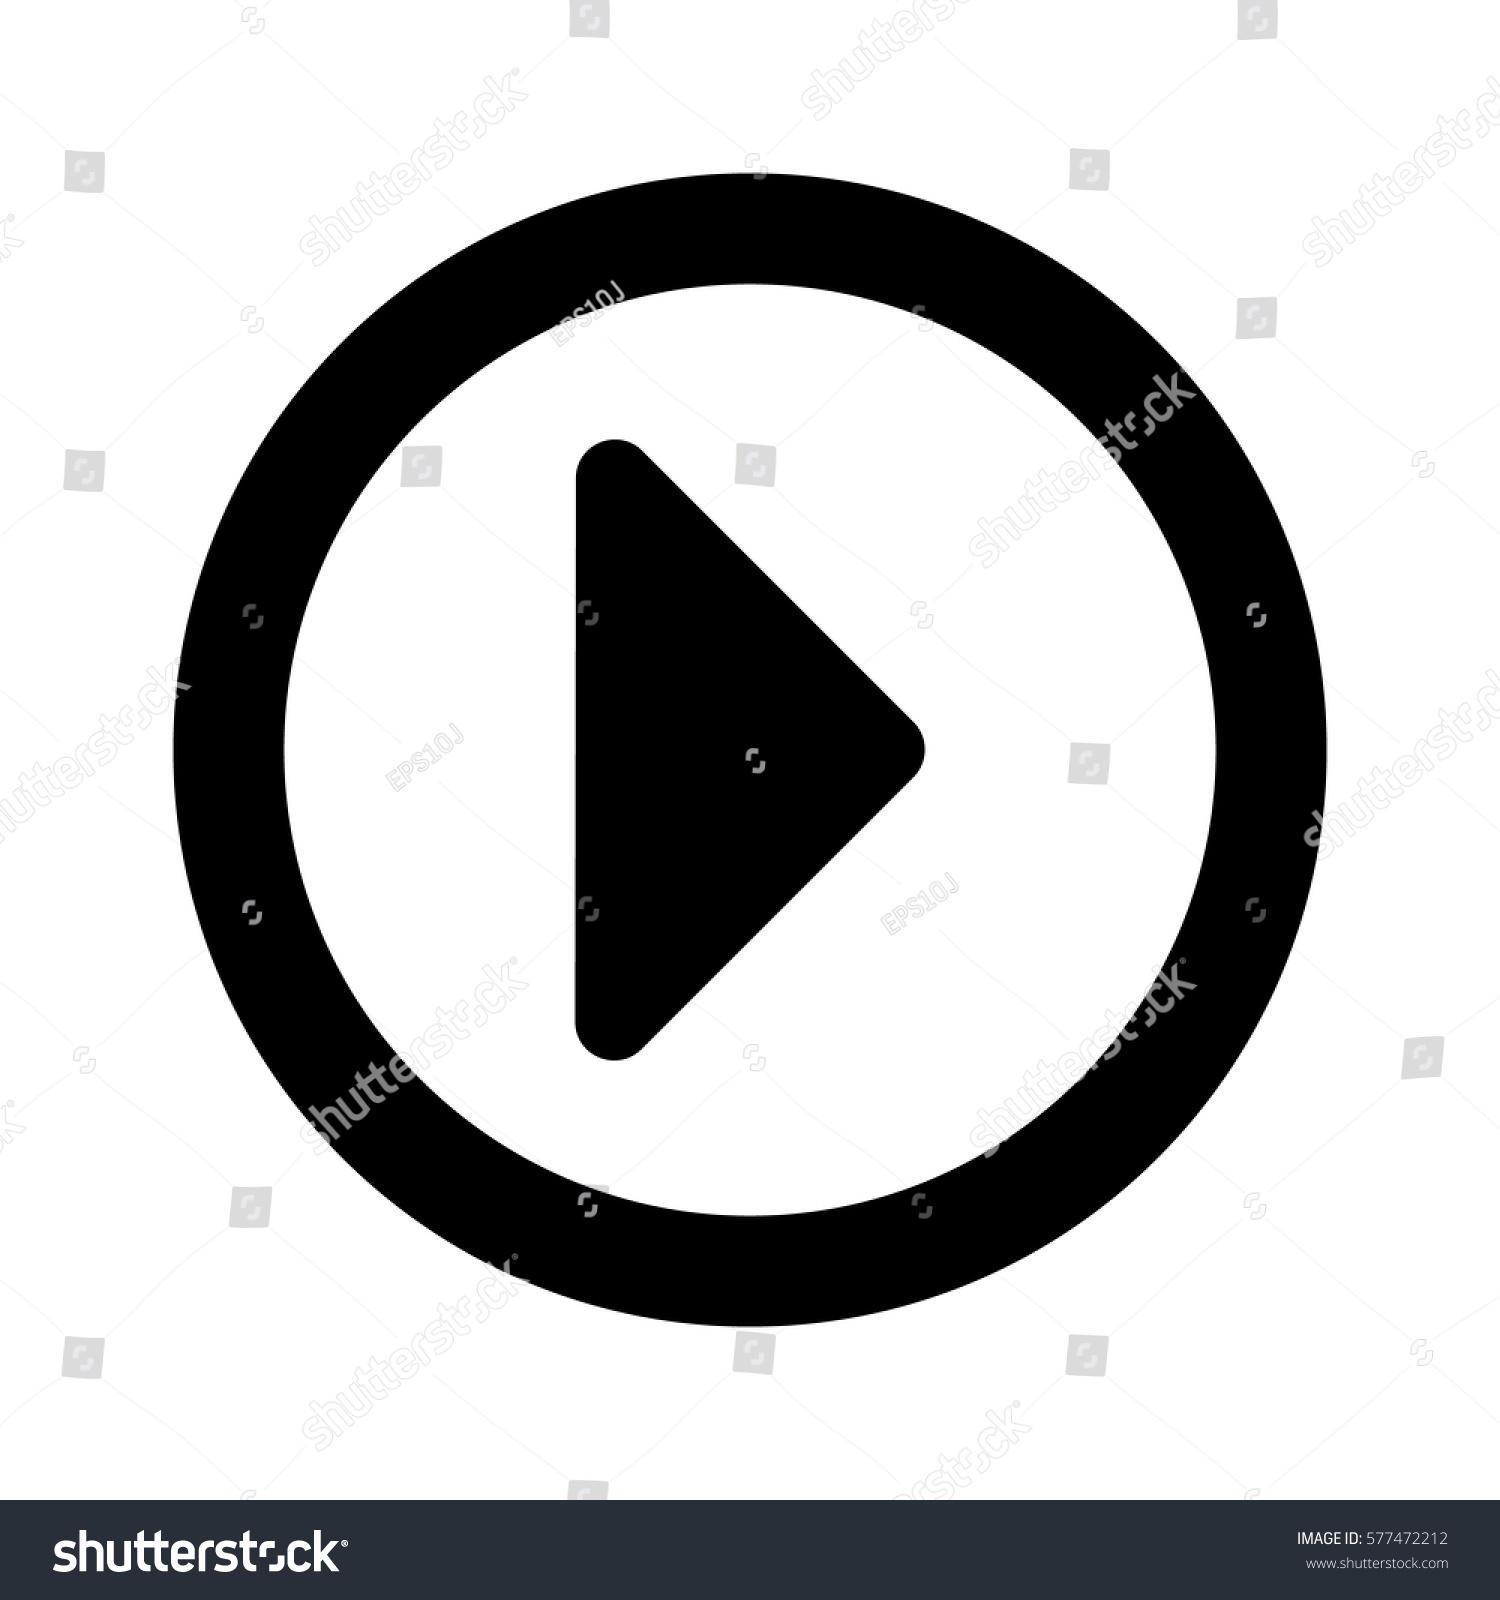 play button icon vector buttons stock vector 577472212 shutterstock rh shutterstock com vector google play button vector video play button